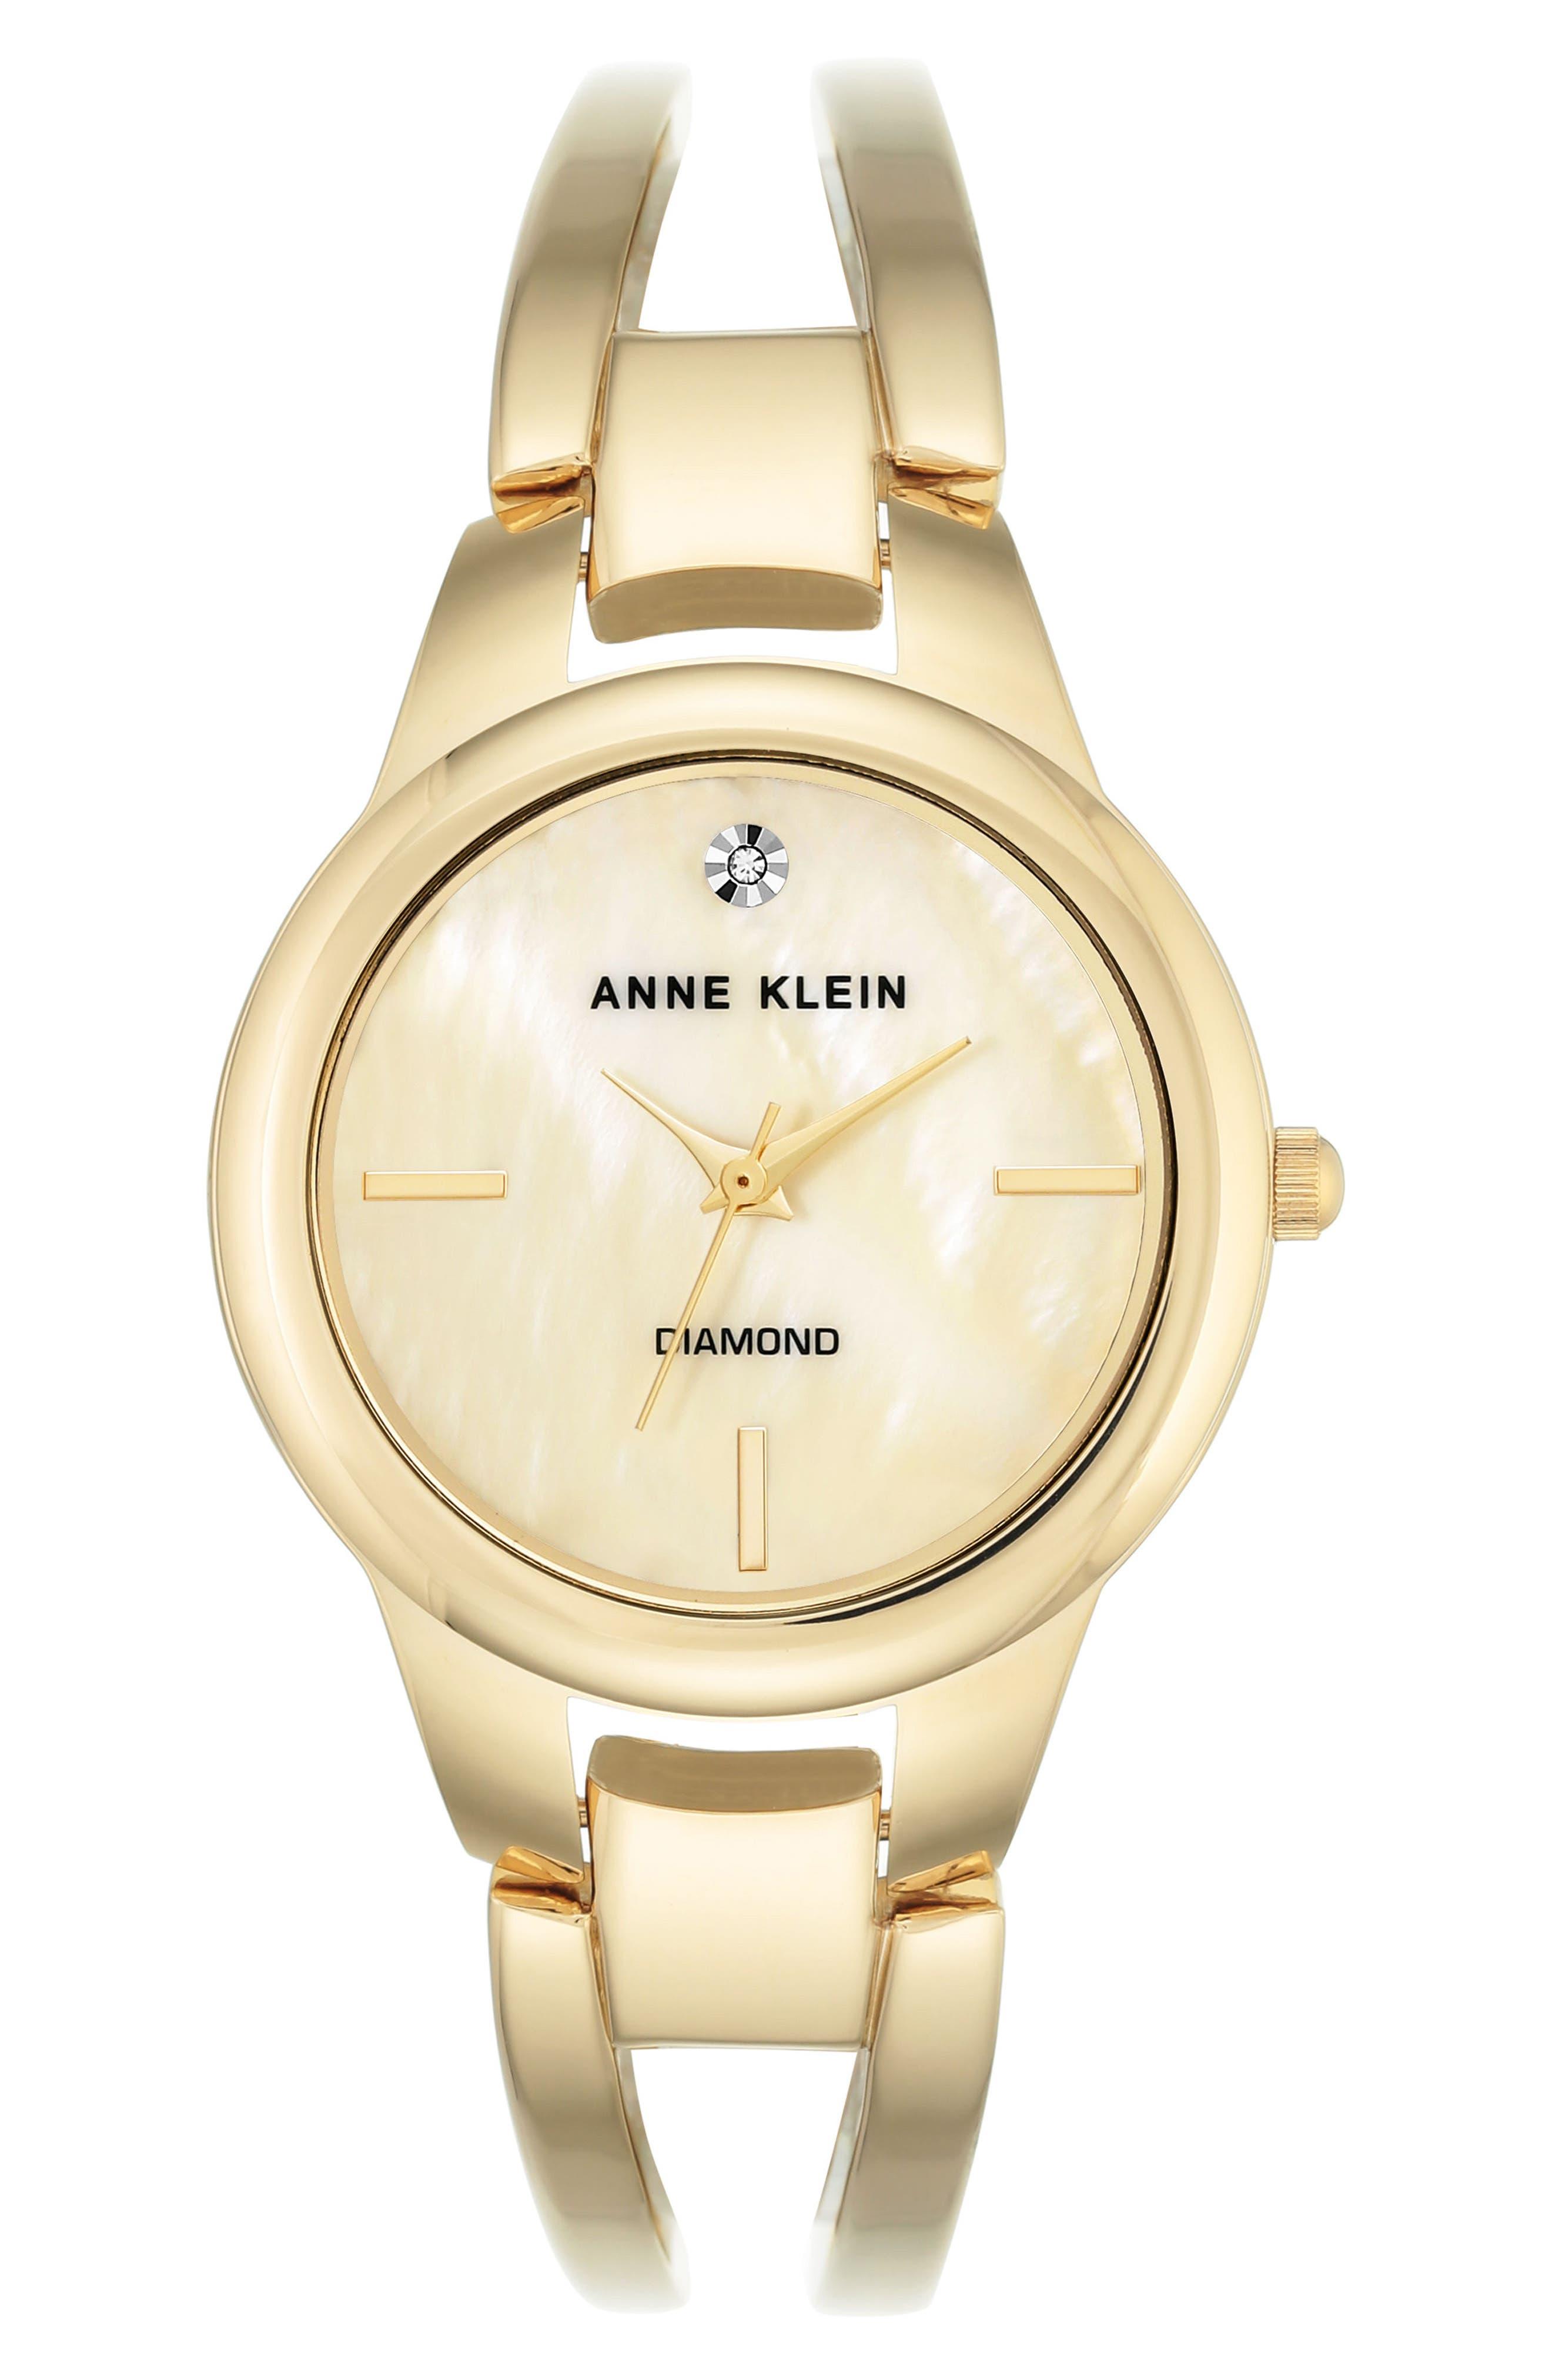 ANNE KLEIN Diamond Oval Bangle Watch, 32mm